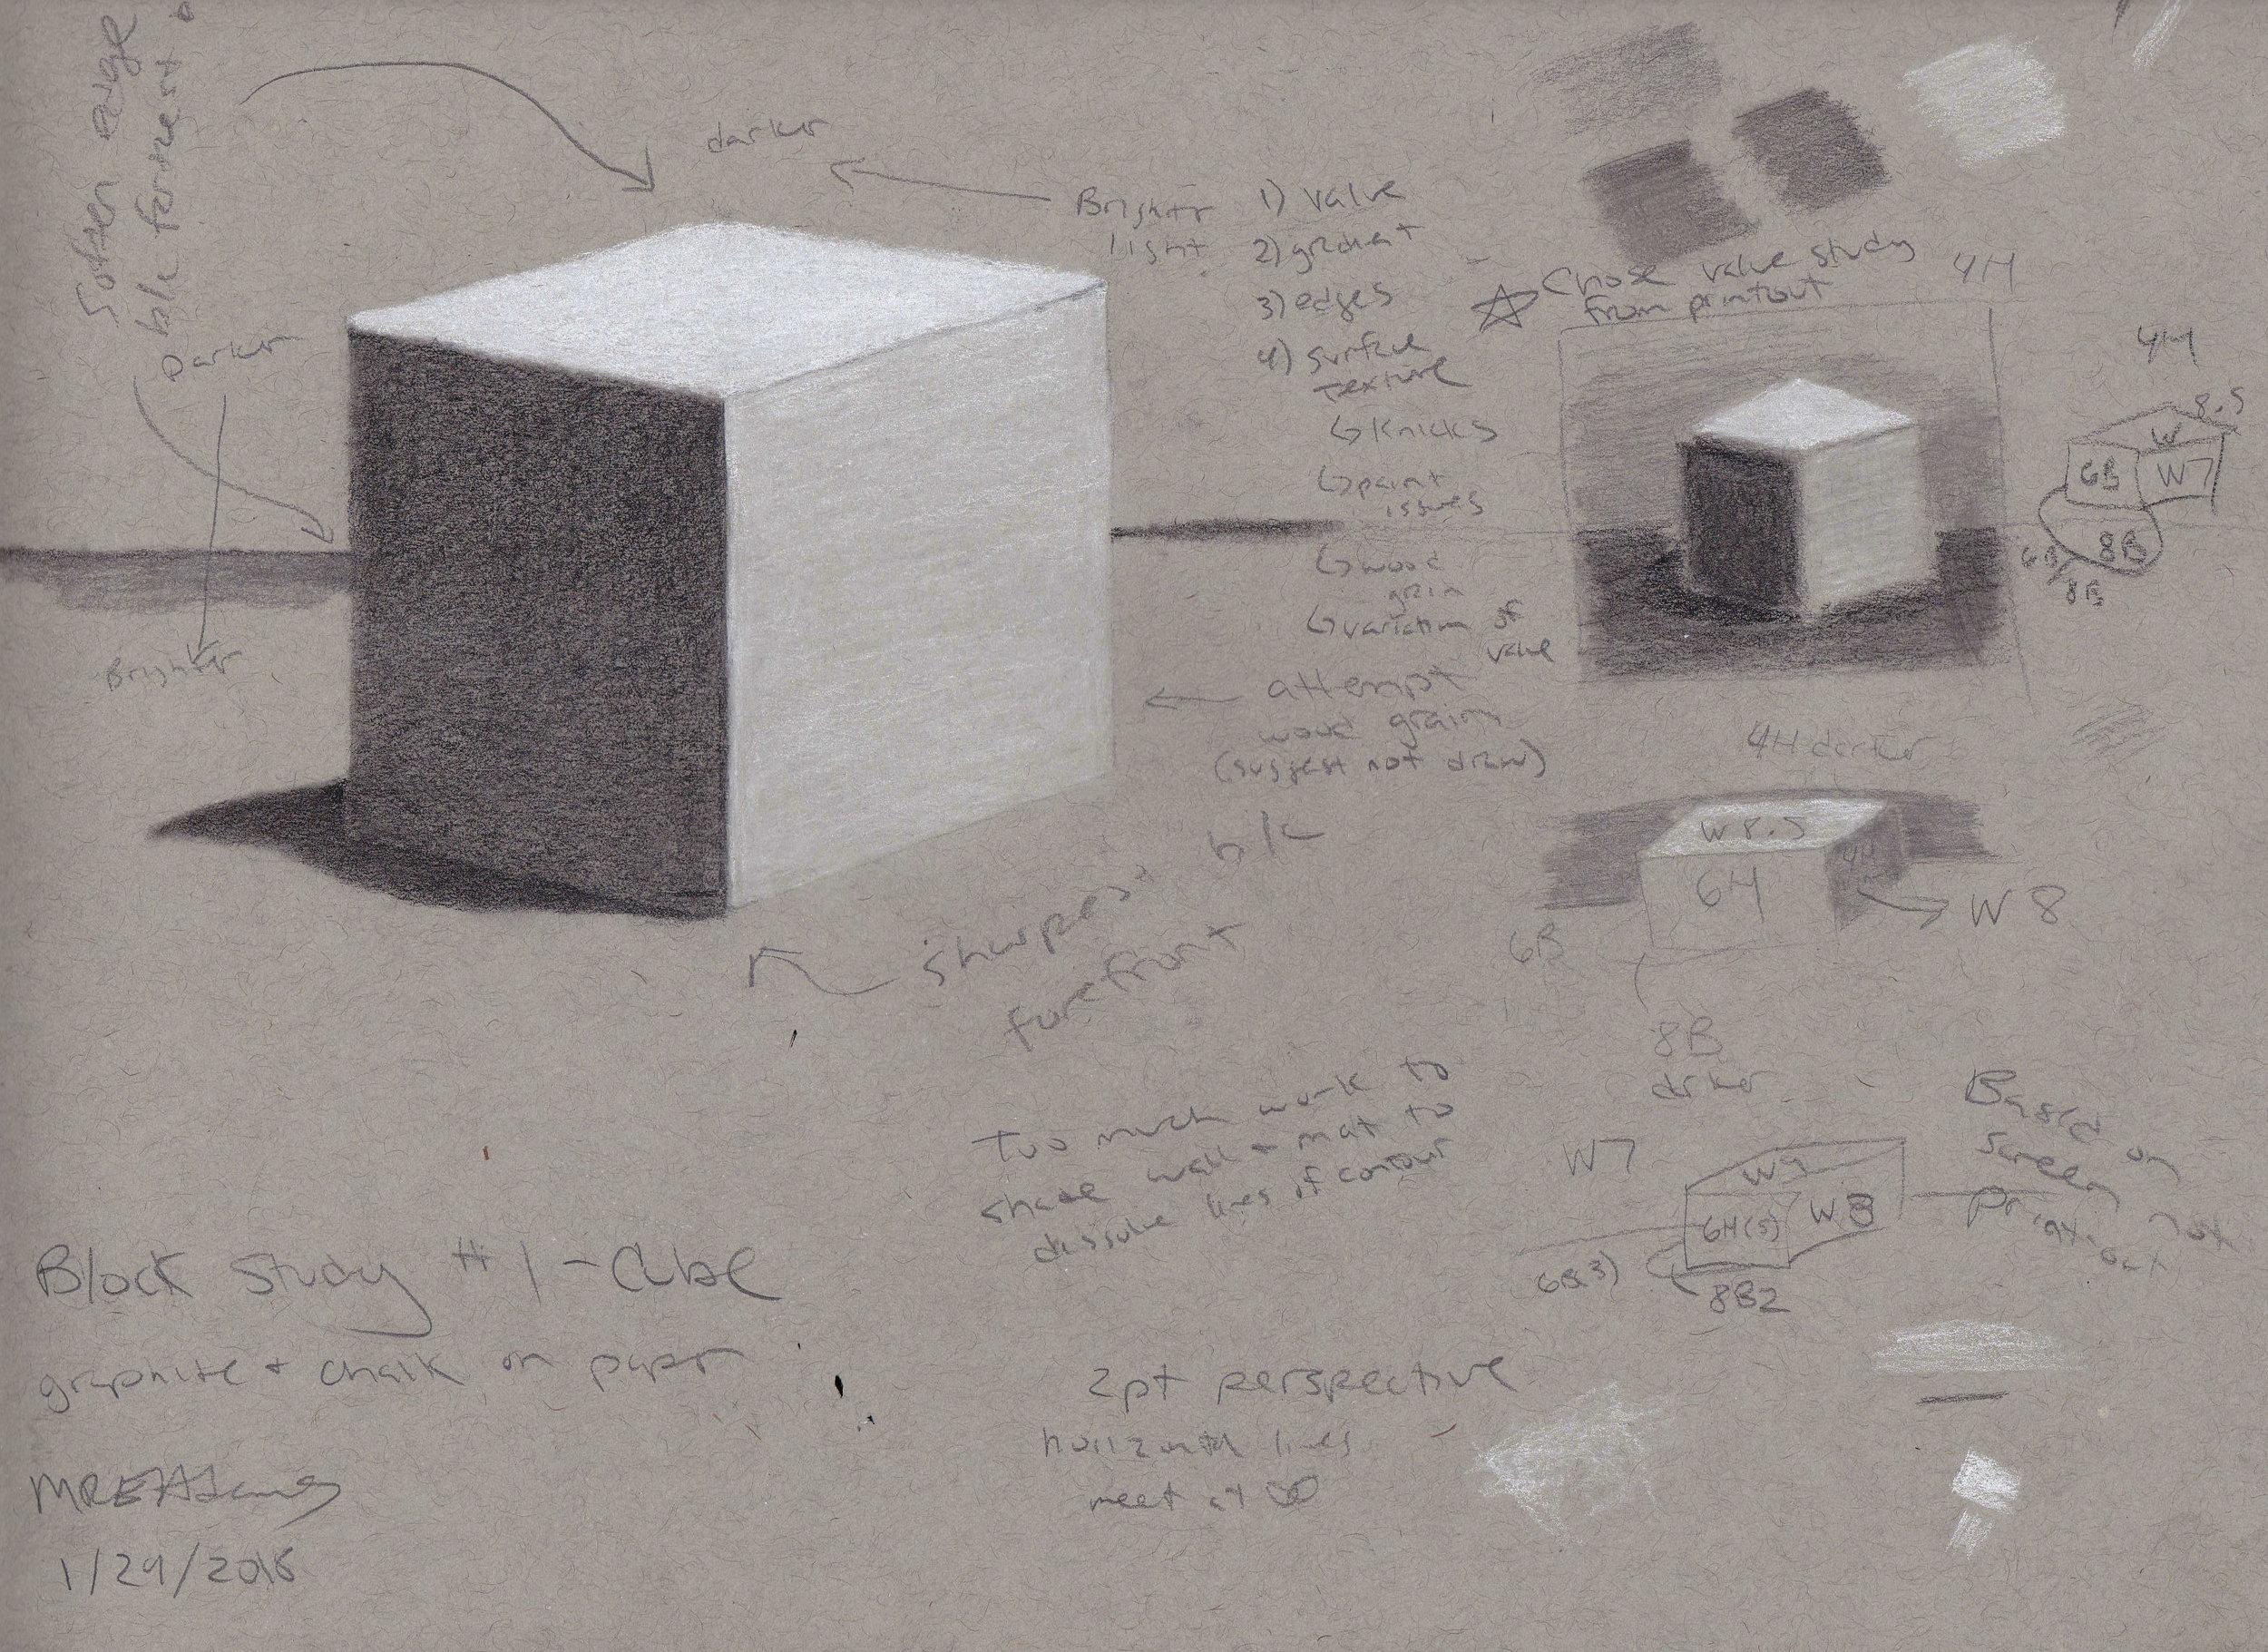 Block Study #1 - Cube (1/29/2018) -